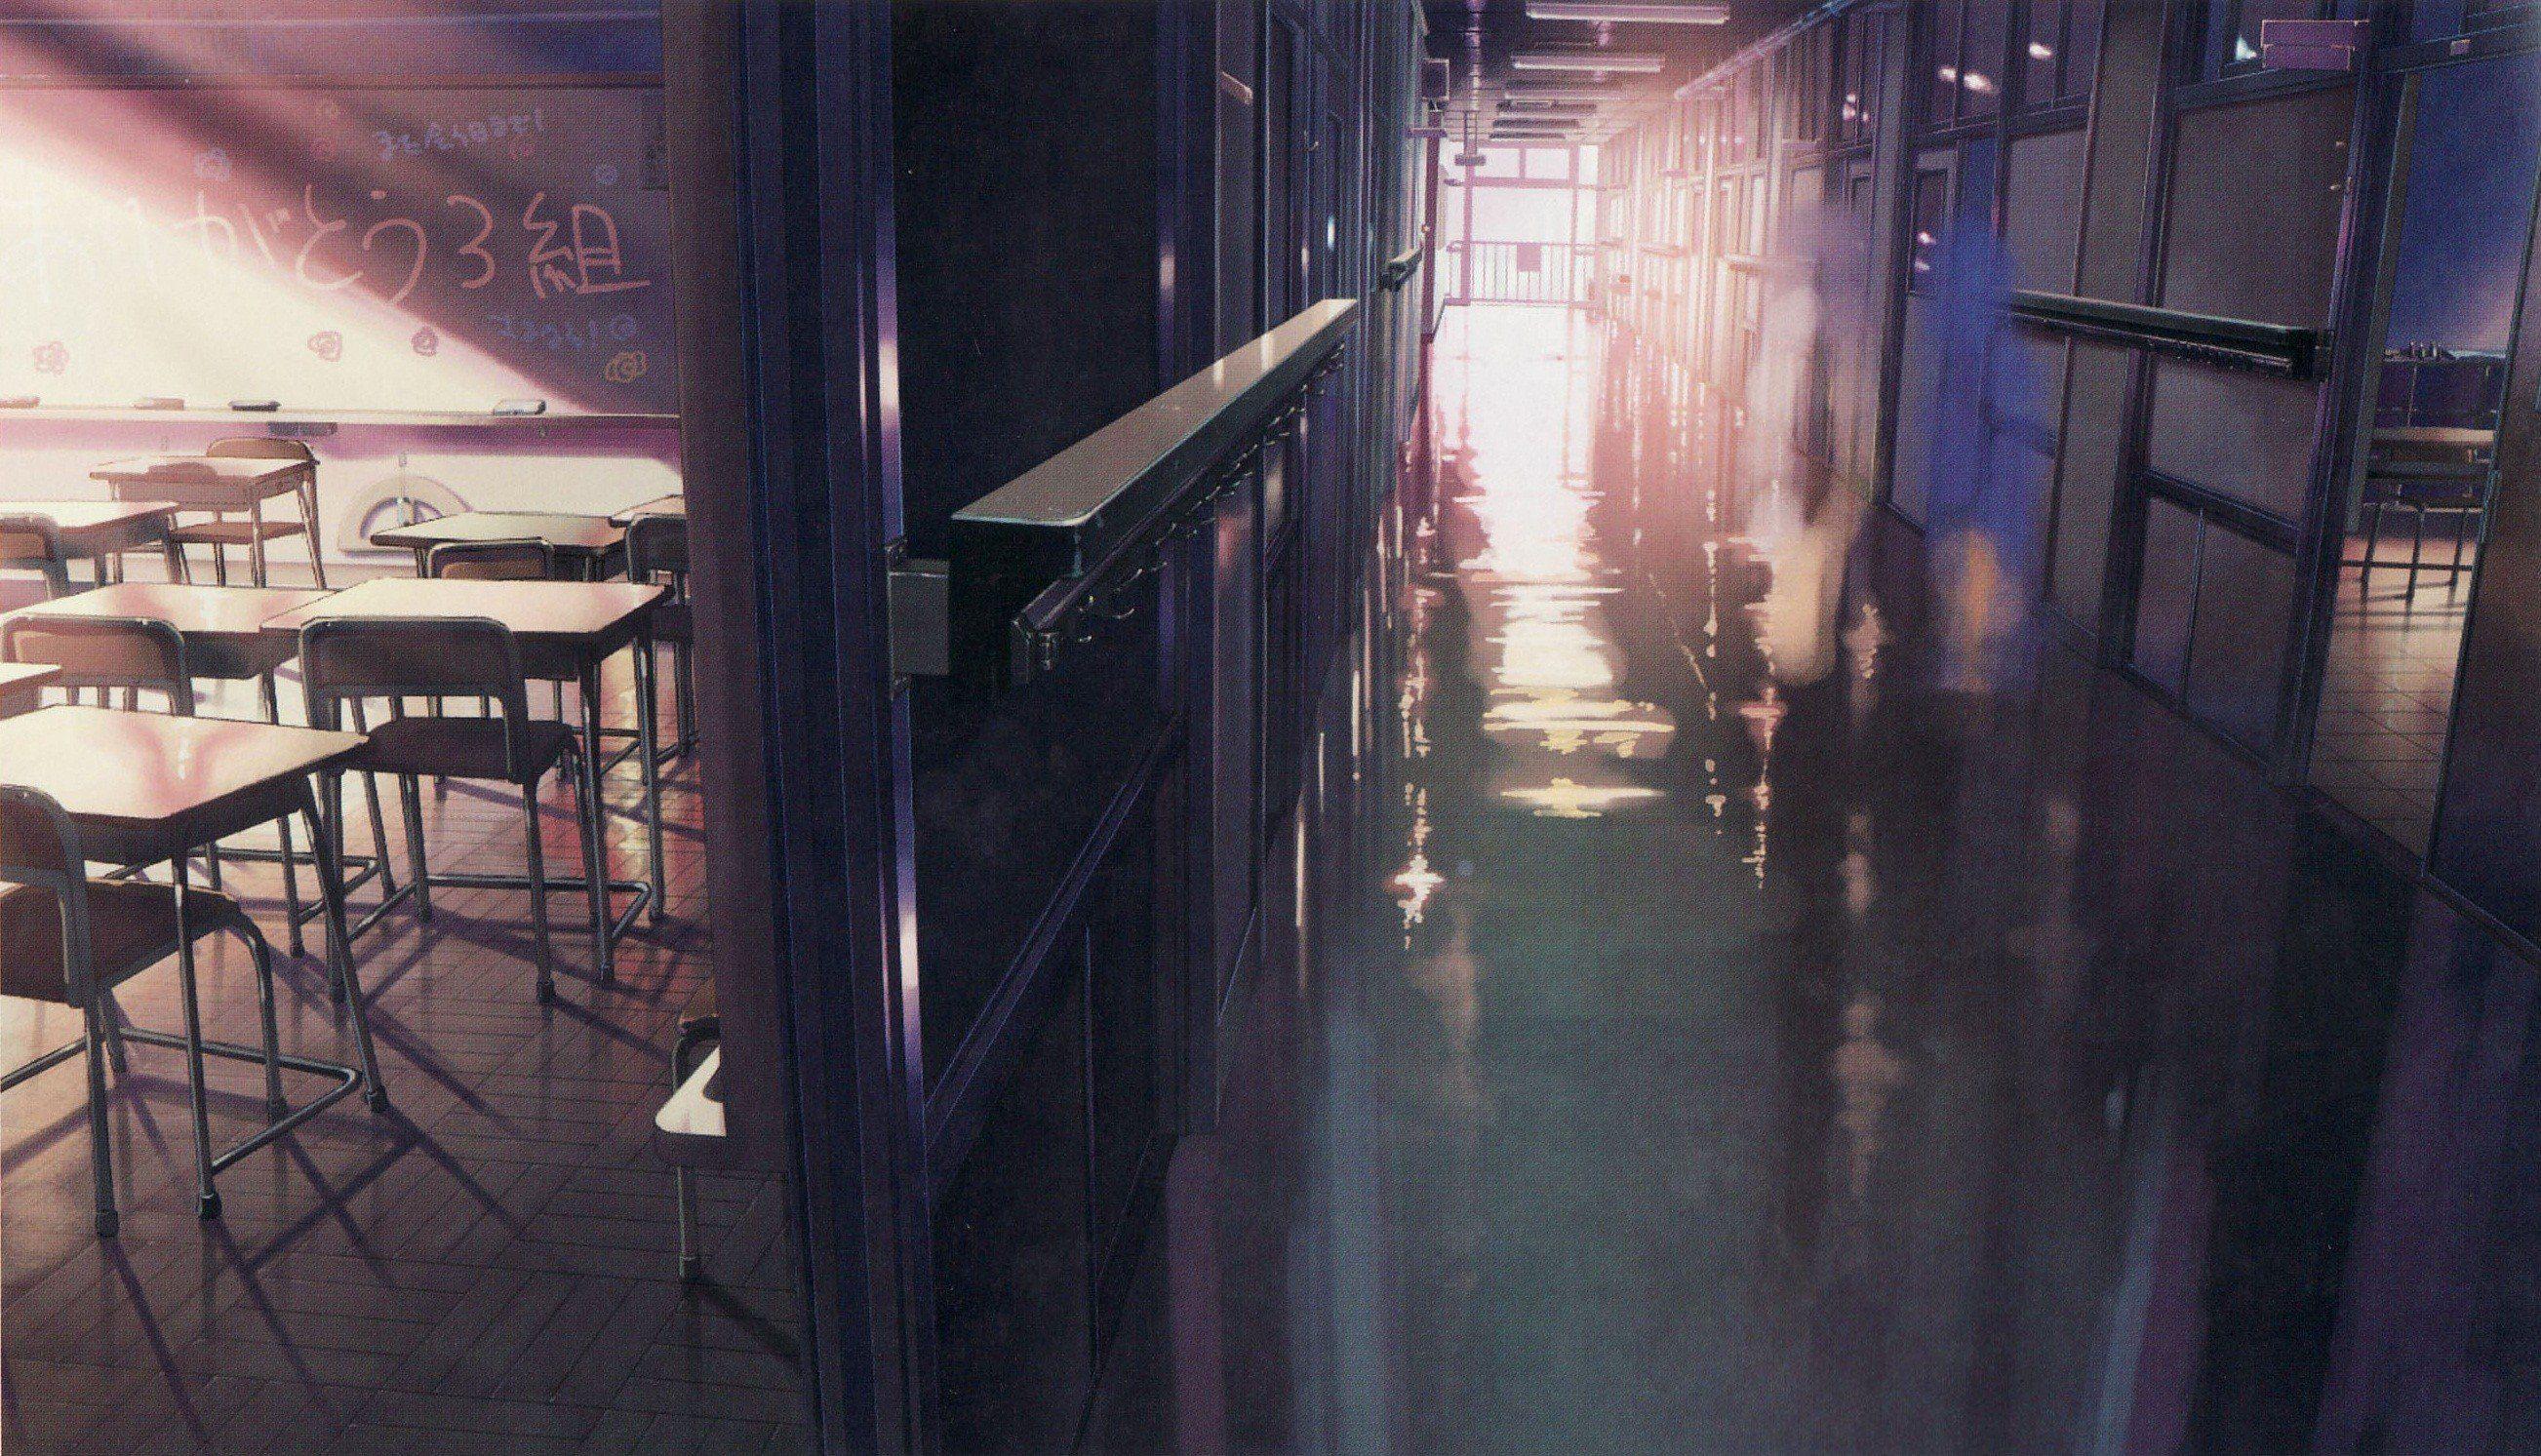 School memories Makoto Shinkai 5 Centimeters Per Second